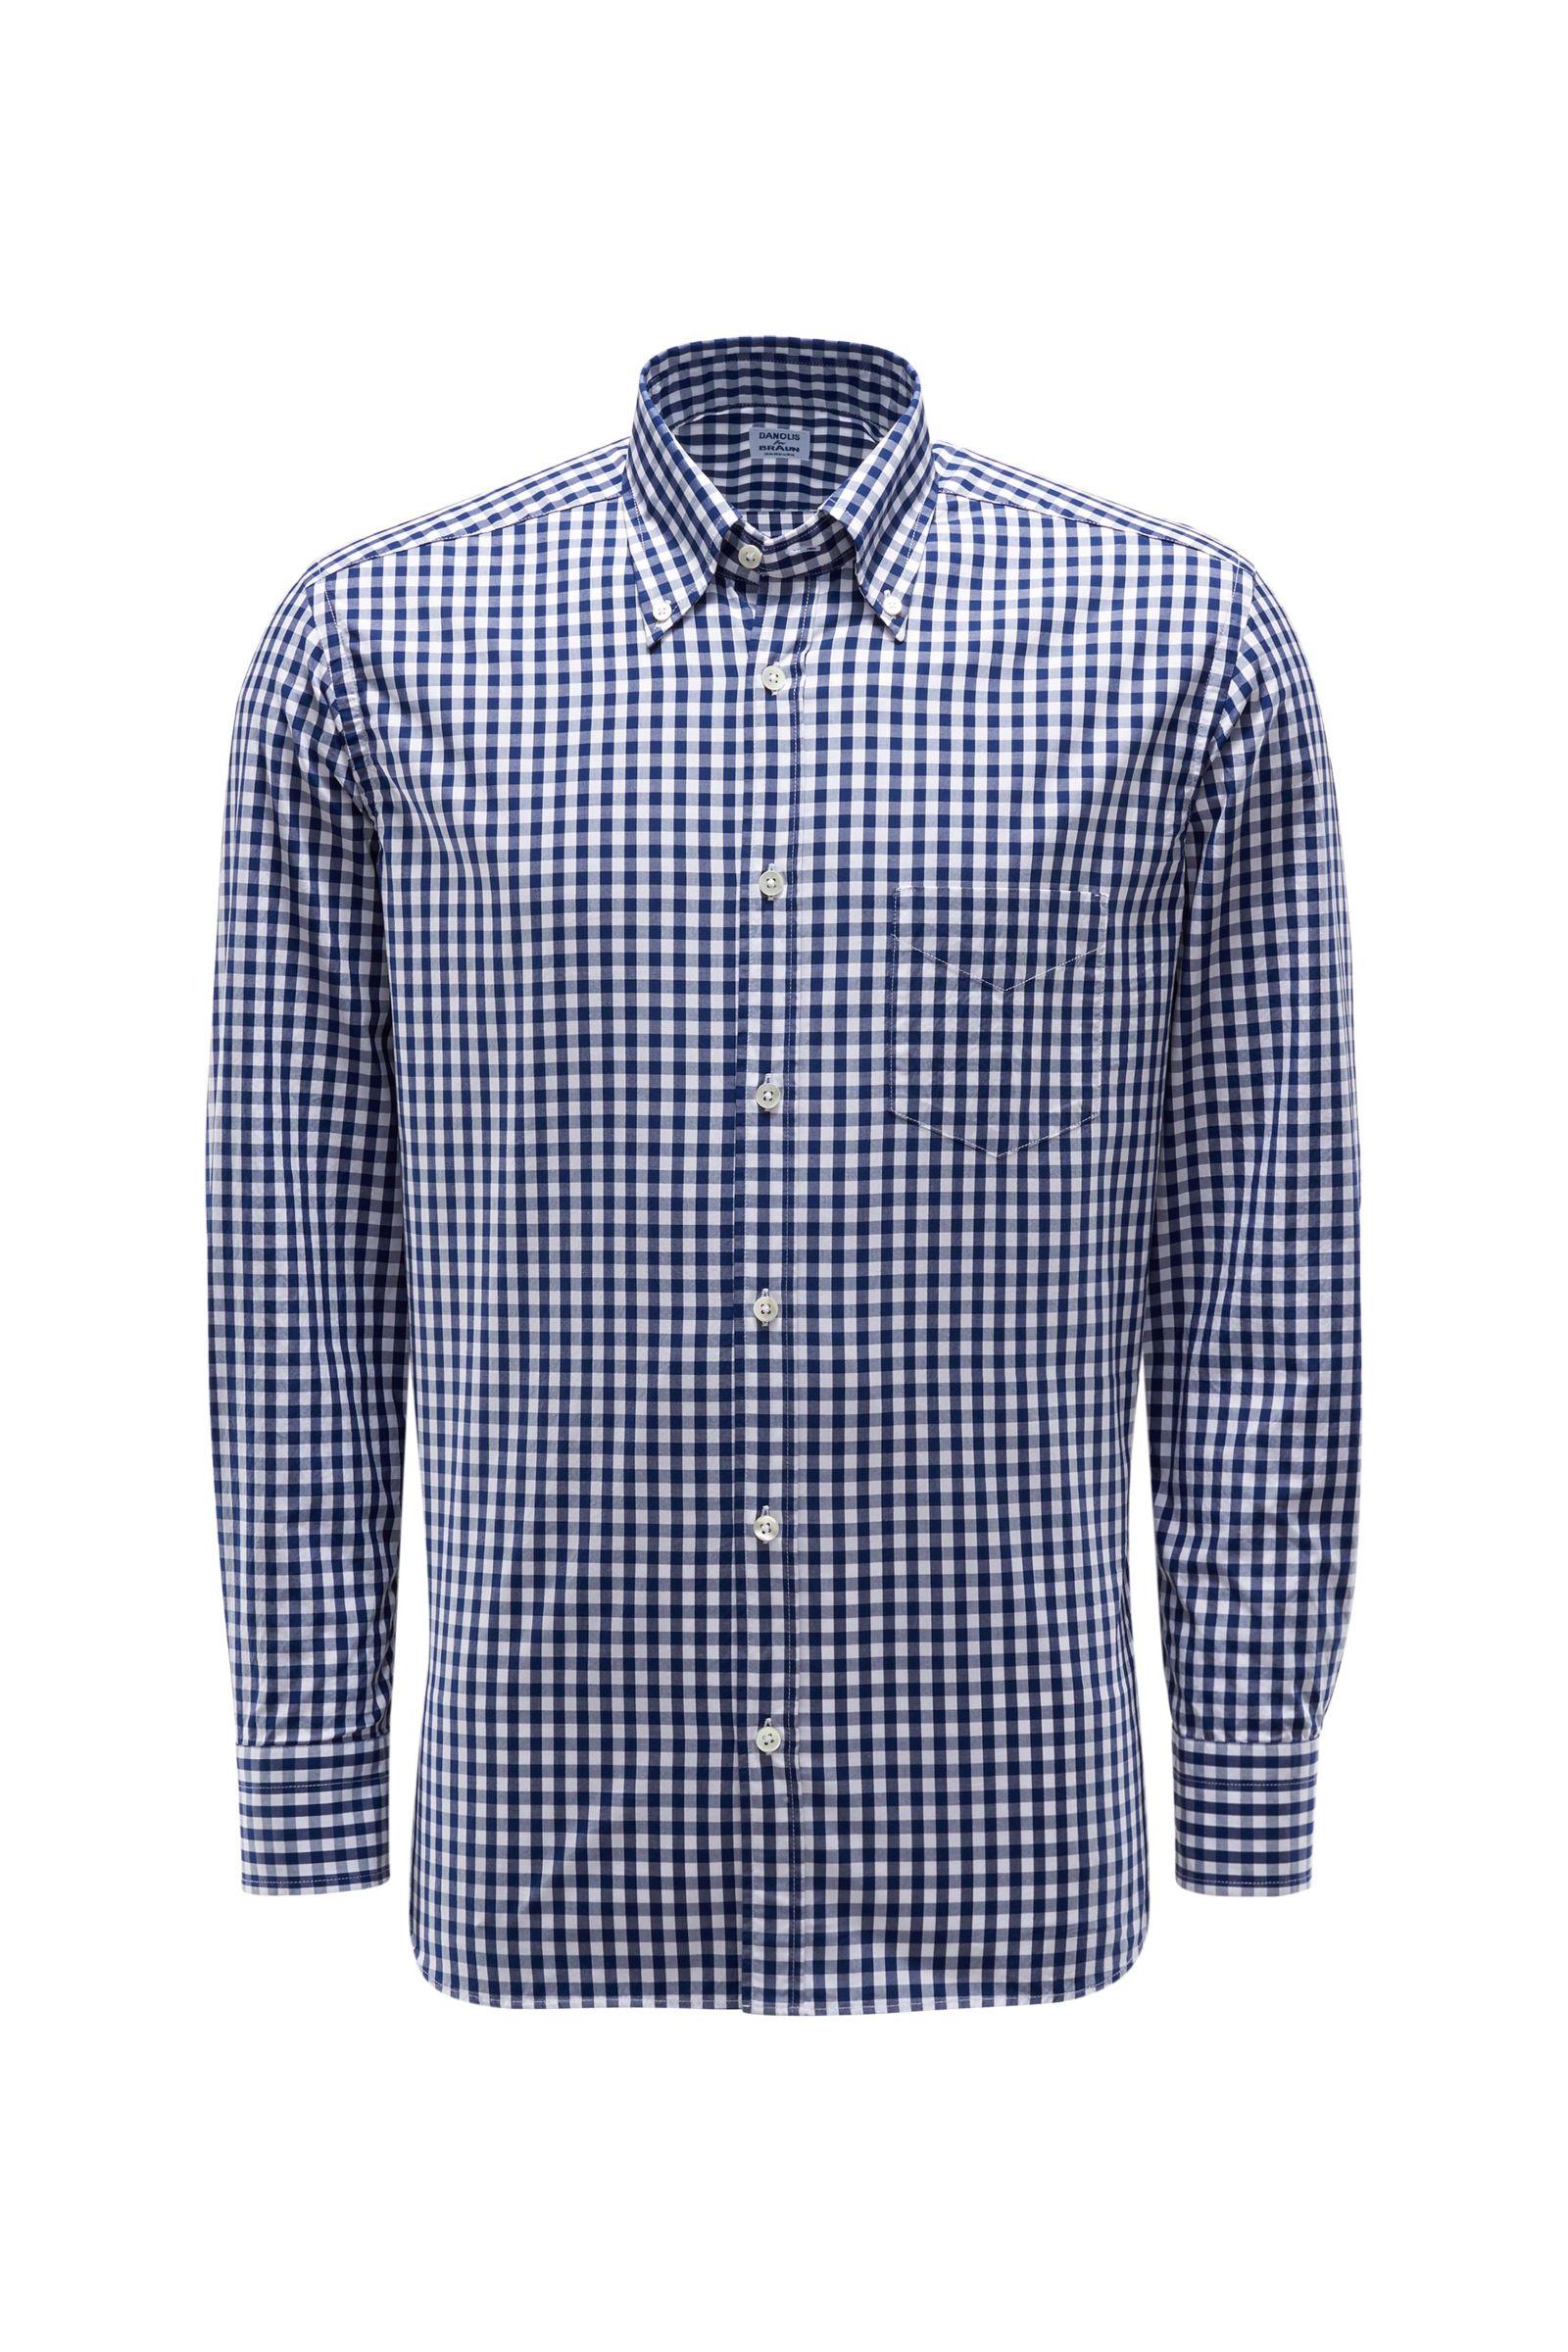 Casual Hemd Button-Down-Kragen dunkelblau/weiß kariert